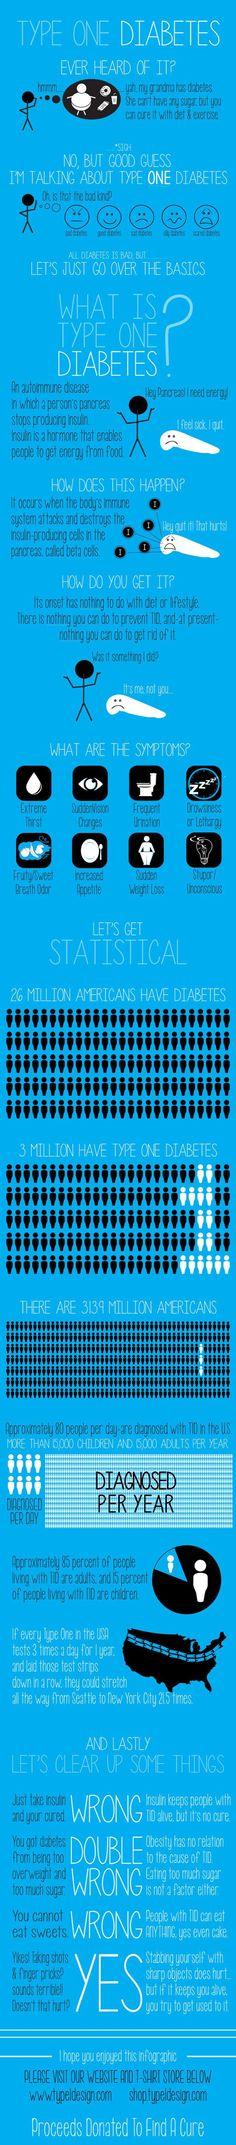 GREAT - info graphic… Spreading Type 1 Diabetes Awareness